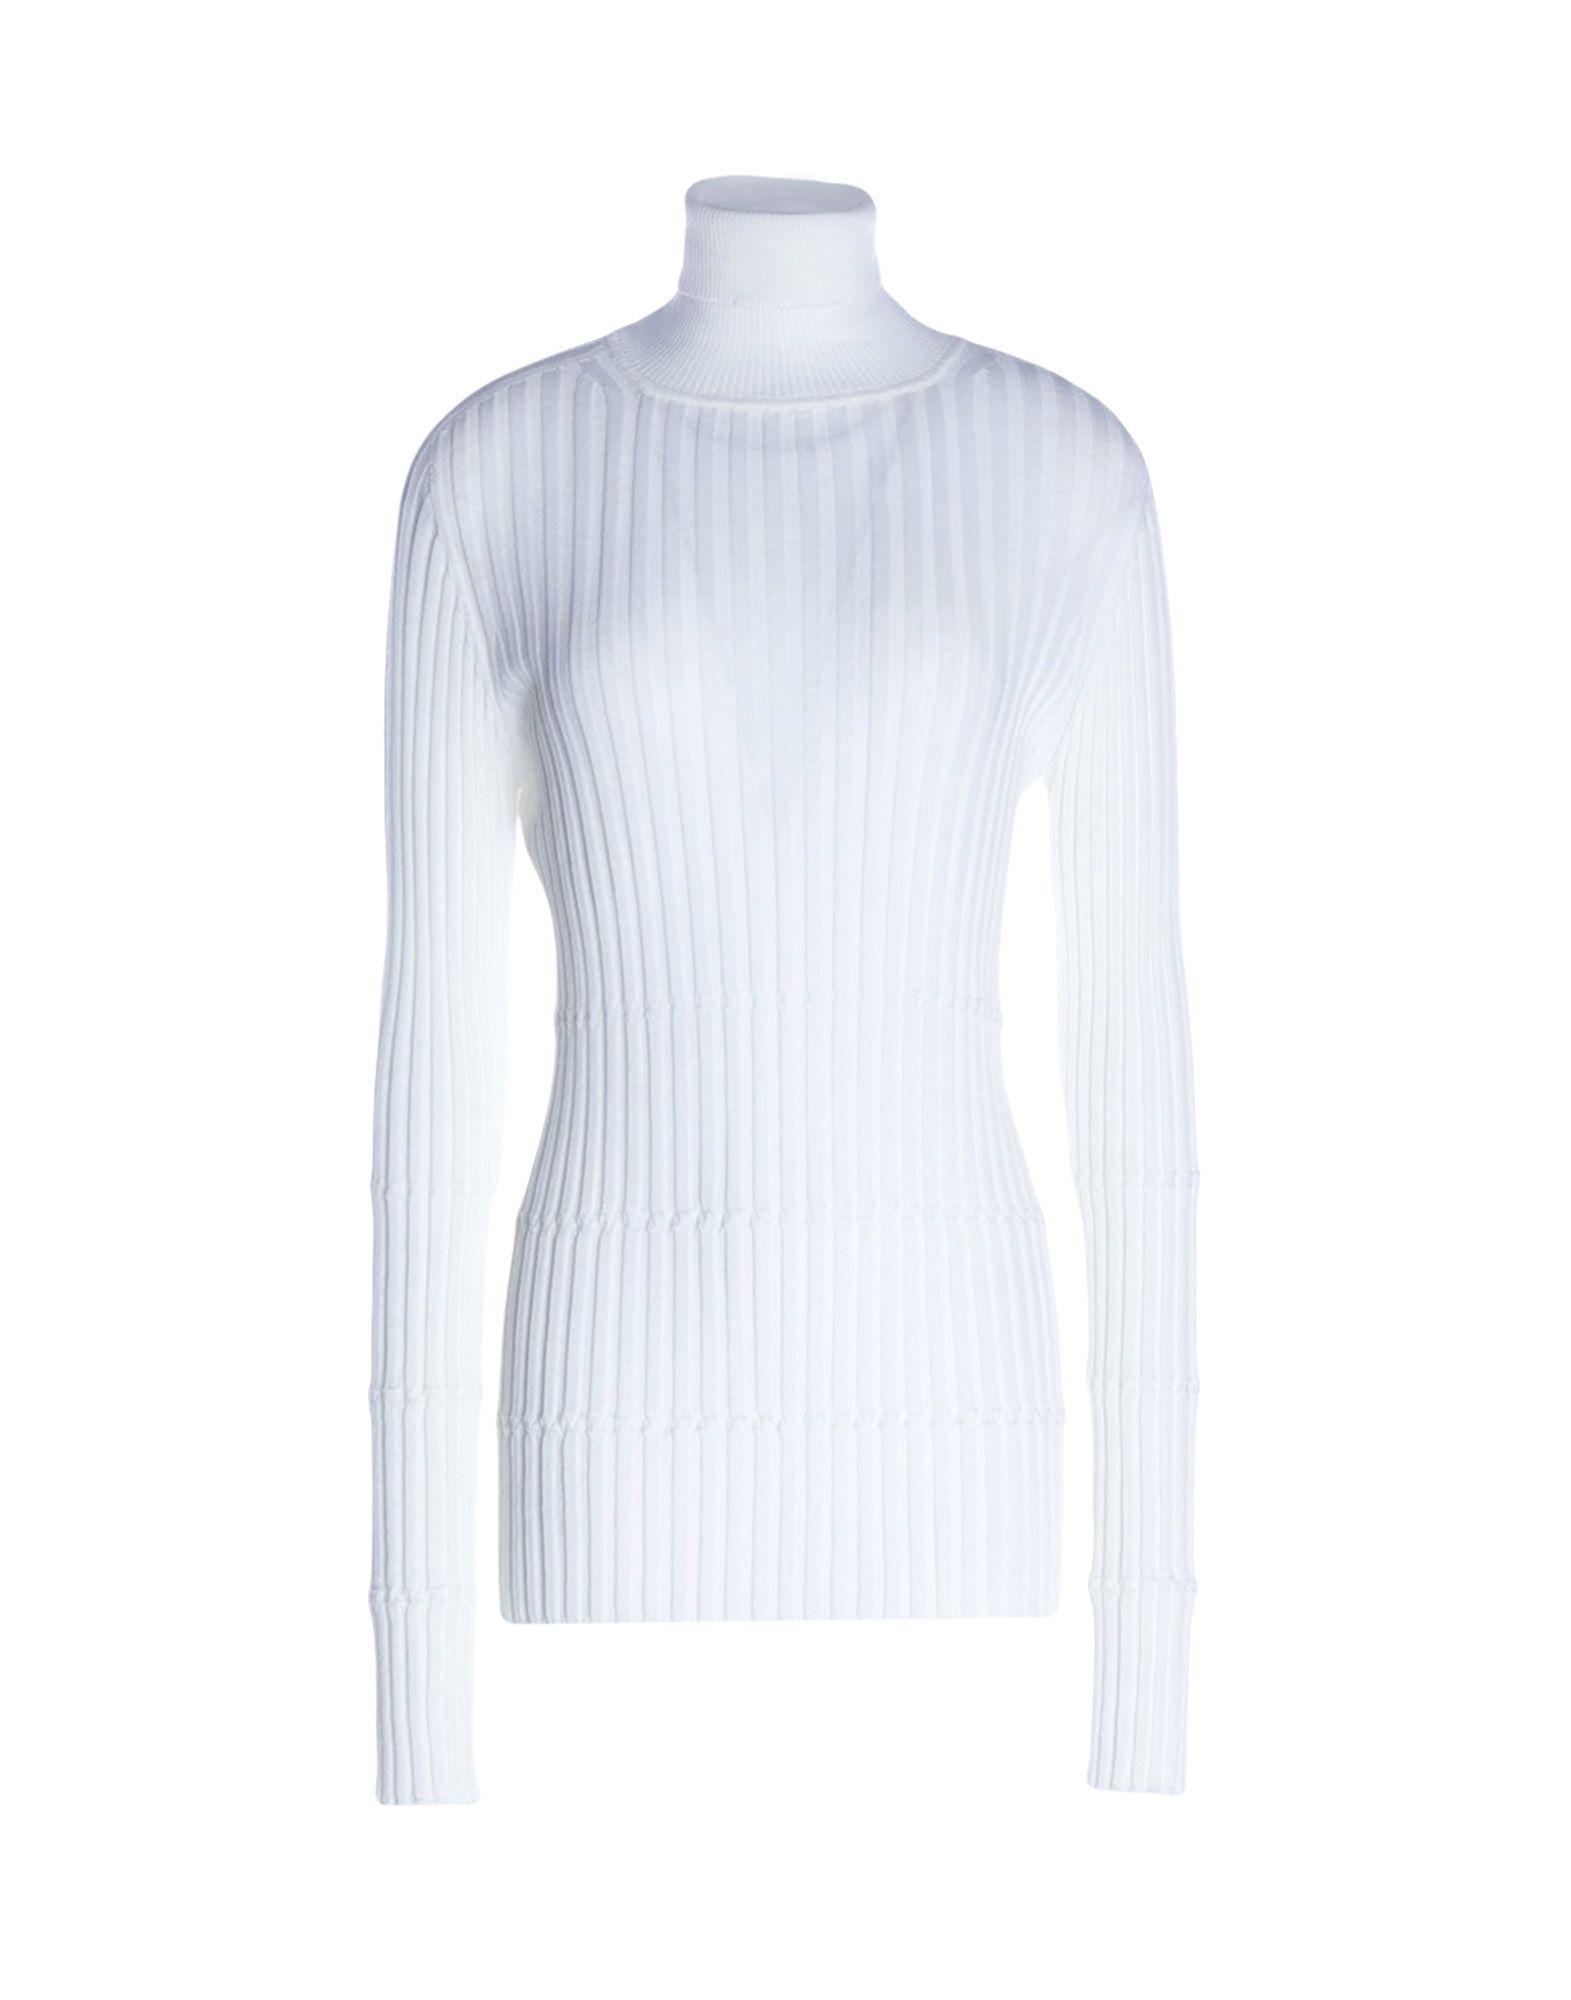 TABARONI CASHMERE Водолазки tabaroni cashmere свитер